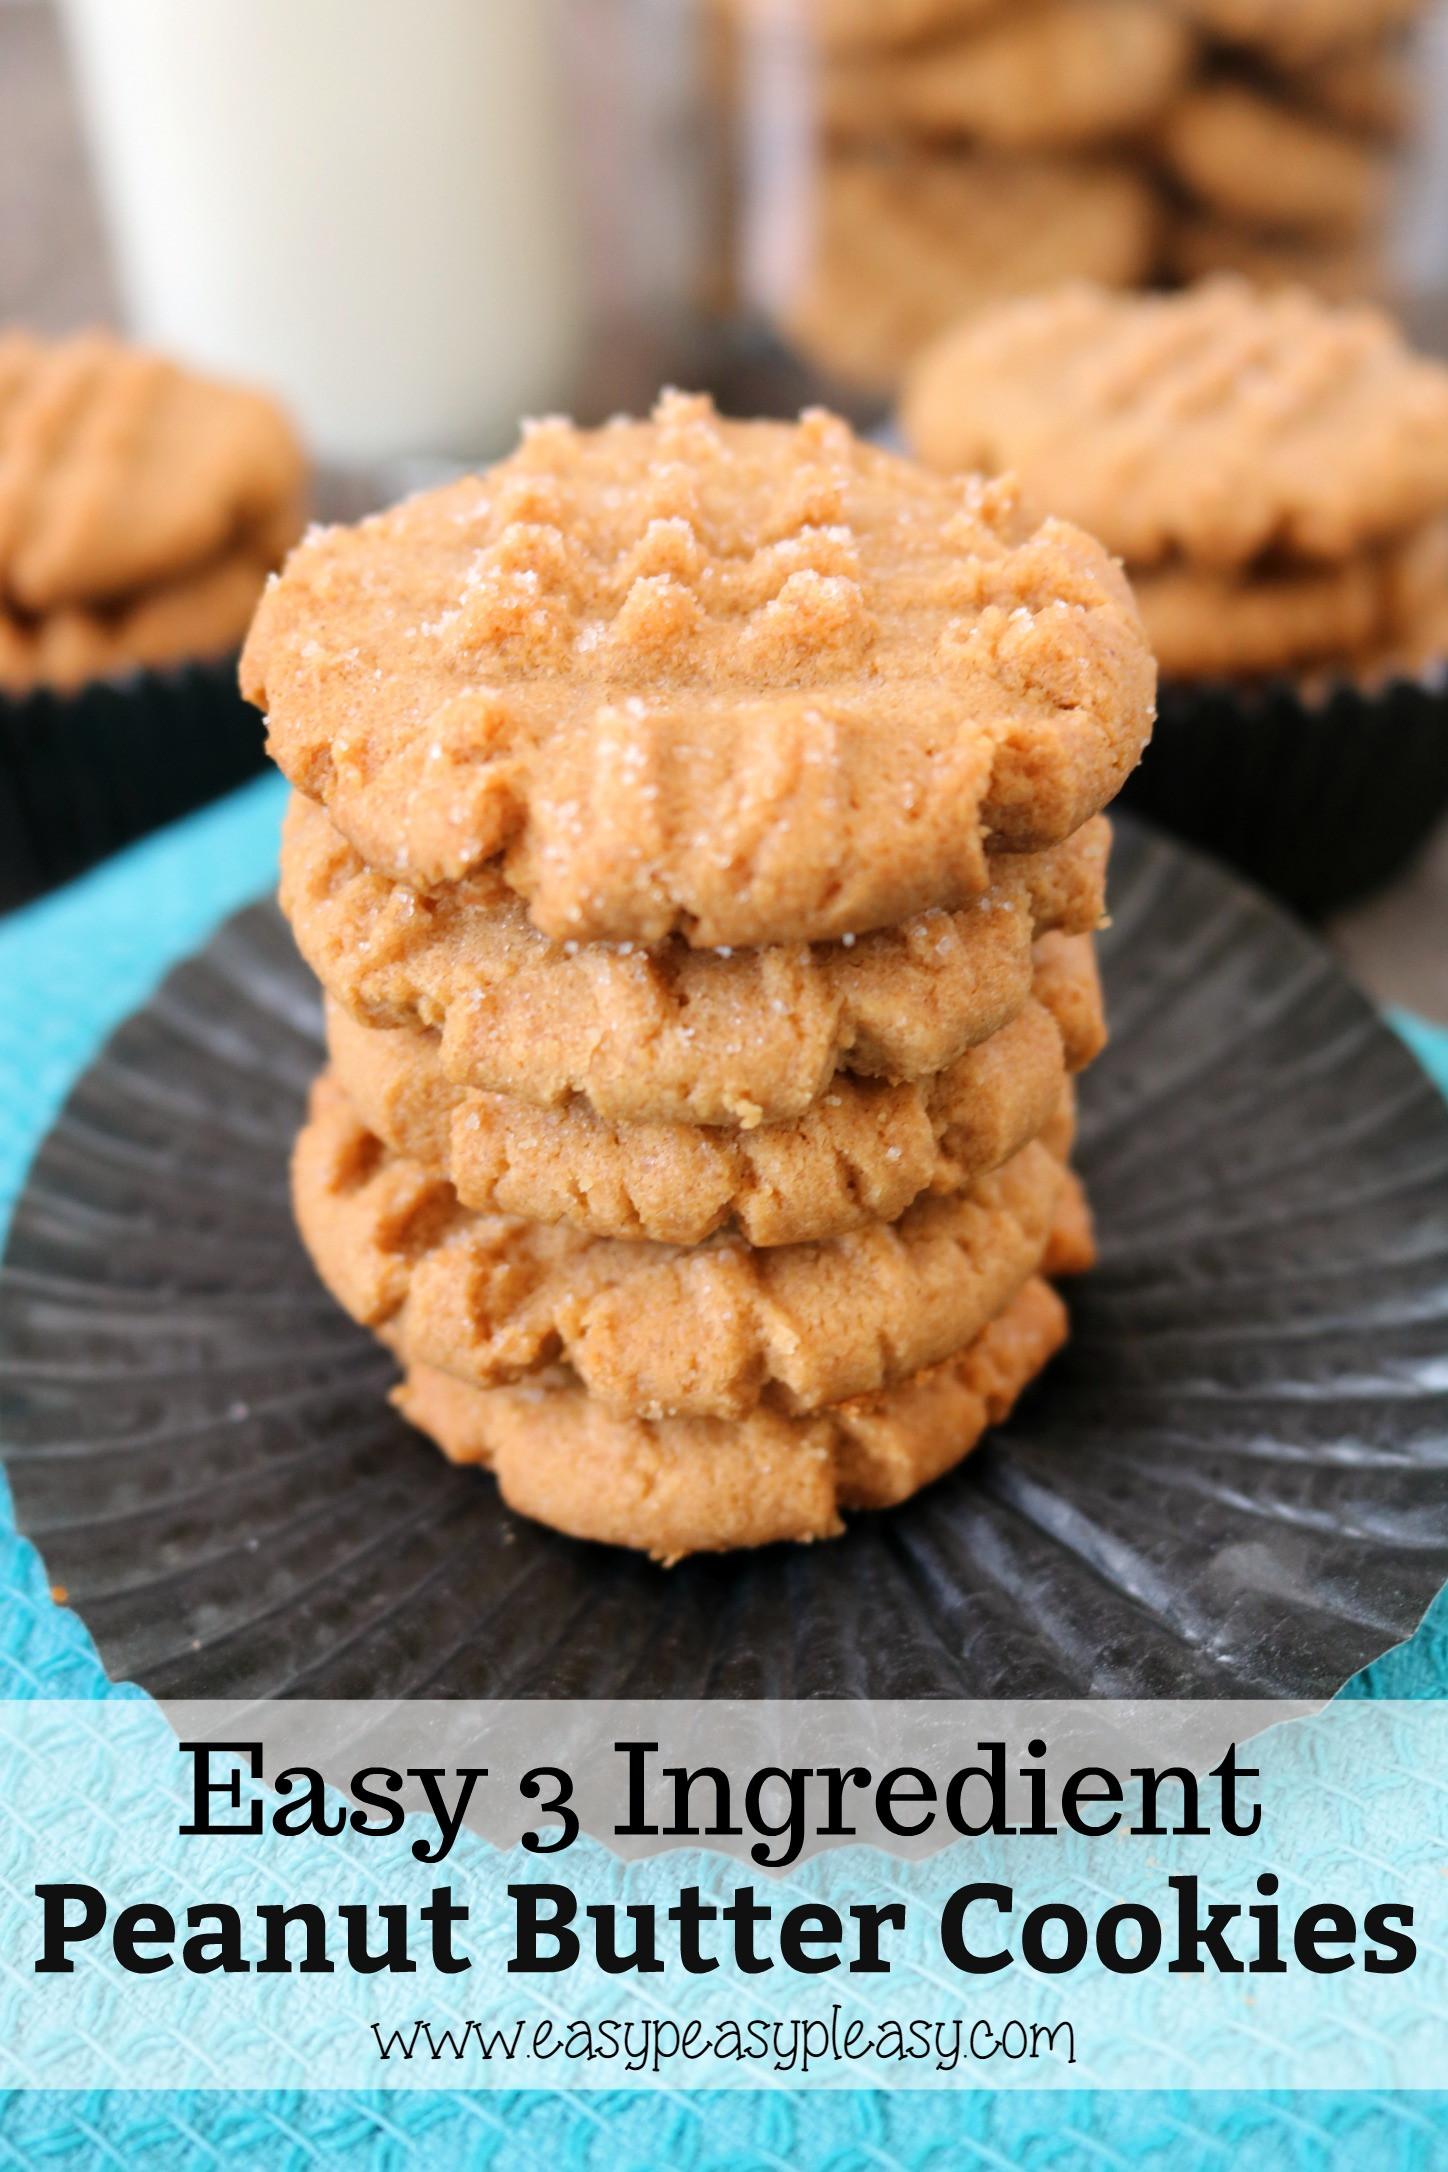 Peanut Butter Cookies Easy  Easy 3 Ingre nt Peanut Butter Cookies Easy Peasy Pleasy